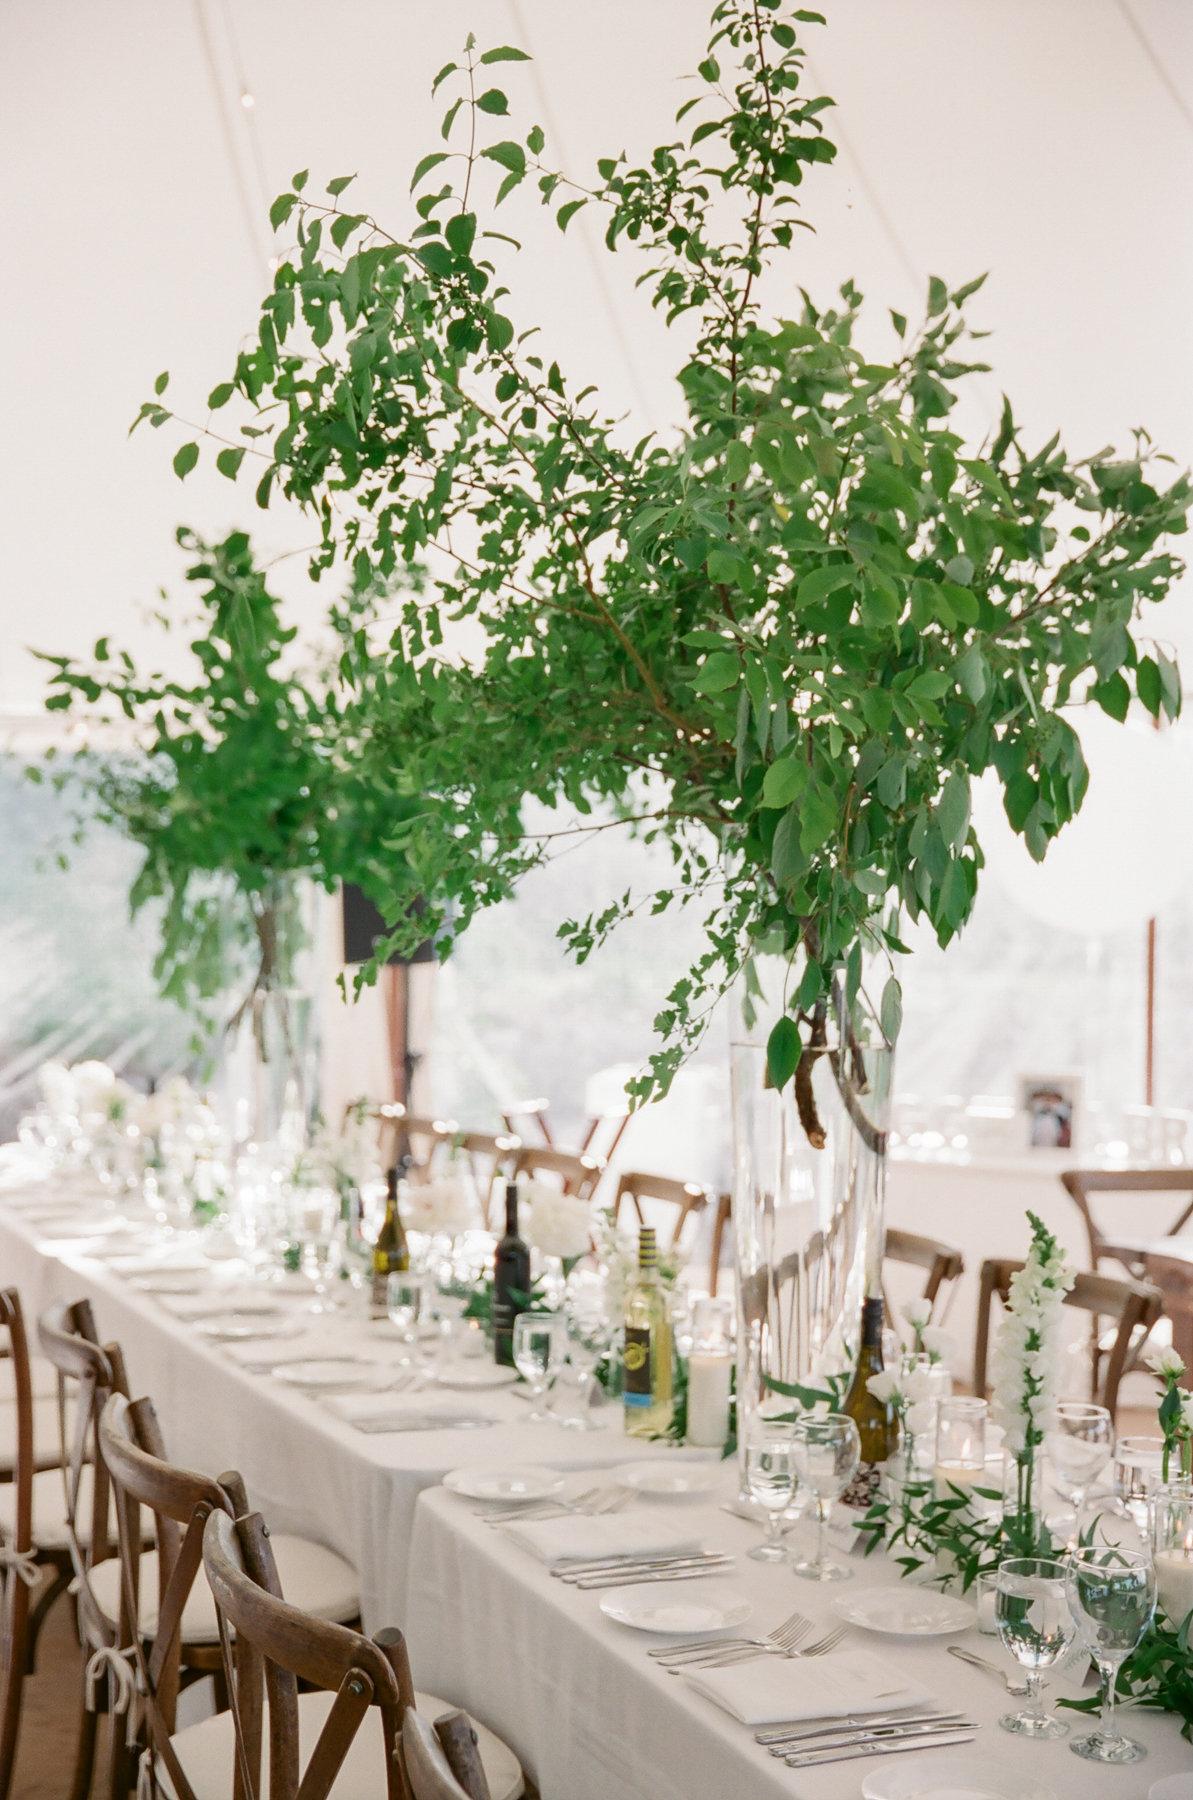 0807-maggiebrett-private-estate-wedding-000006320017.jpg